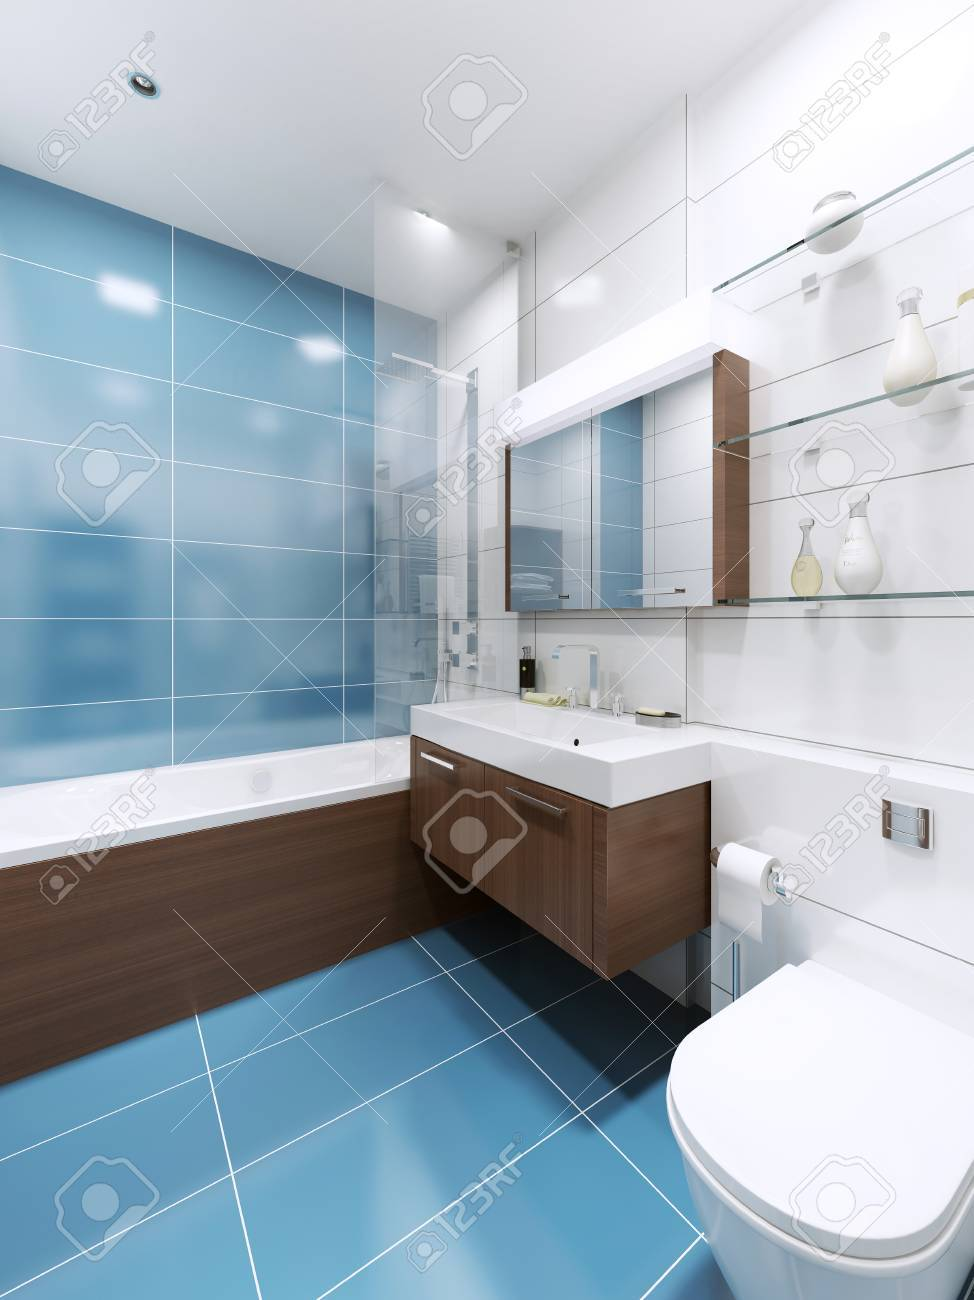 Bilder Badezimmer Blau Badezimmer Grau Blau Great Badezimmer